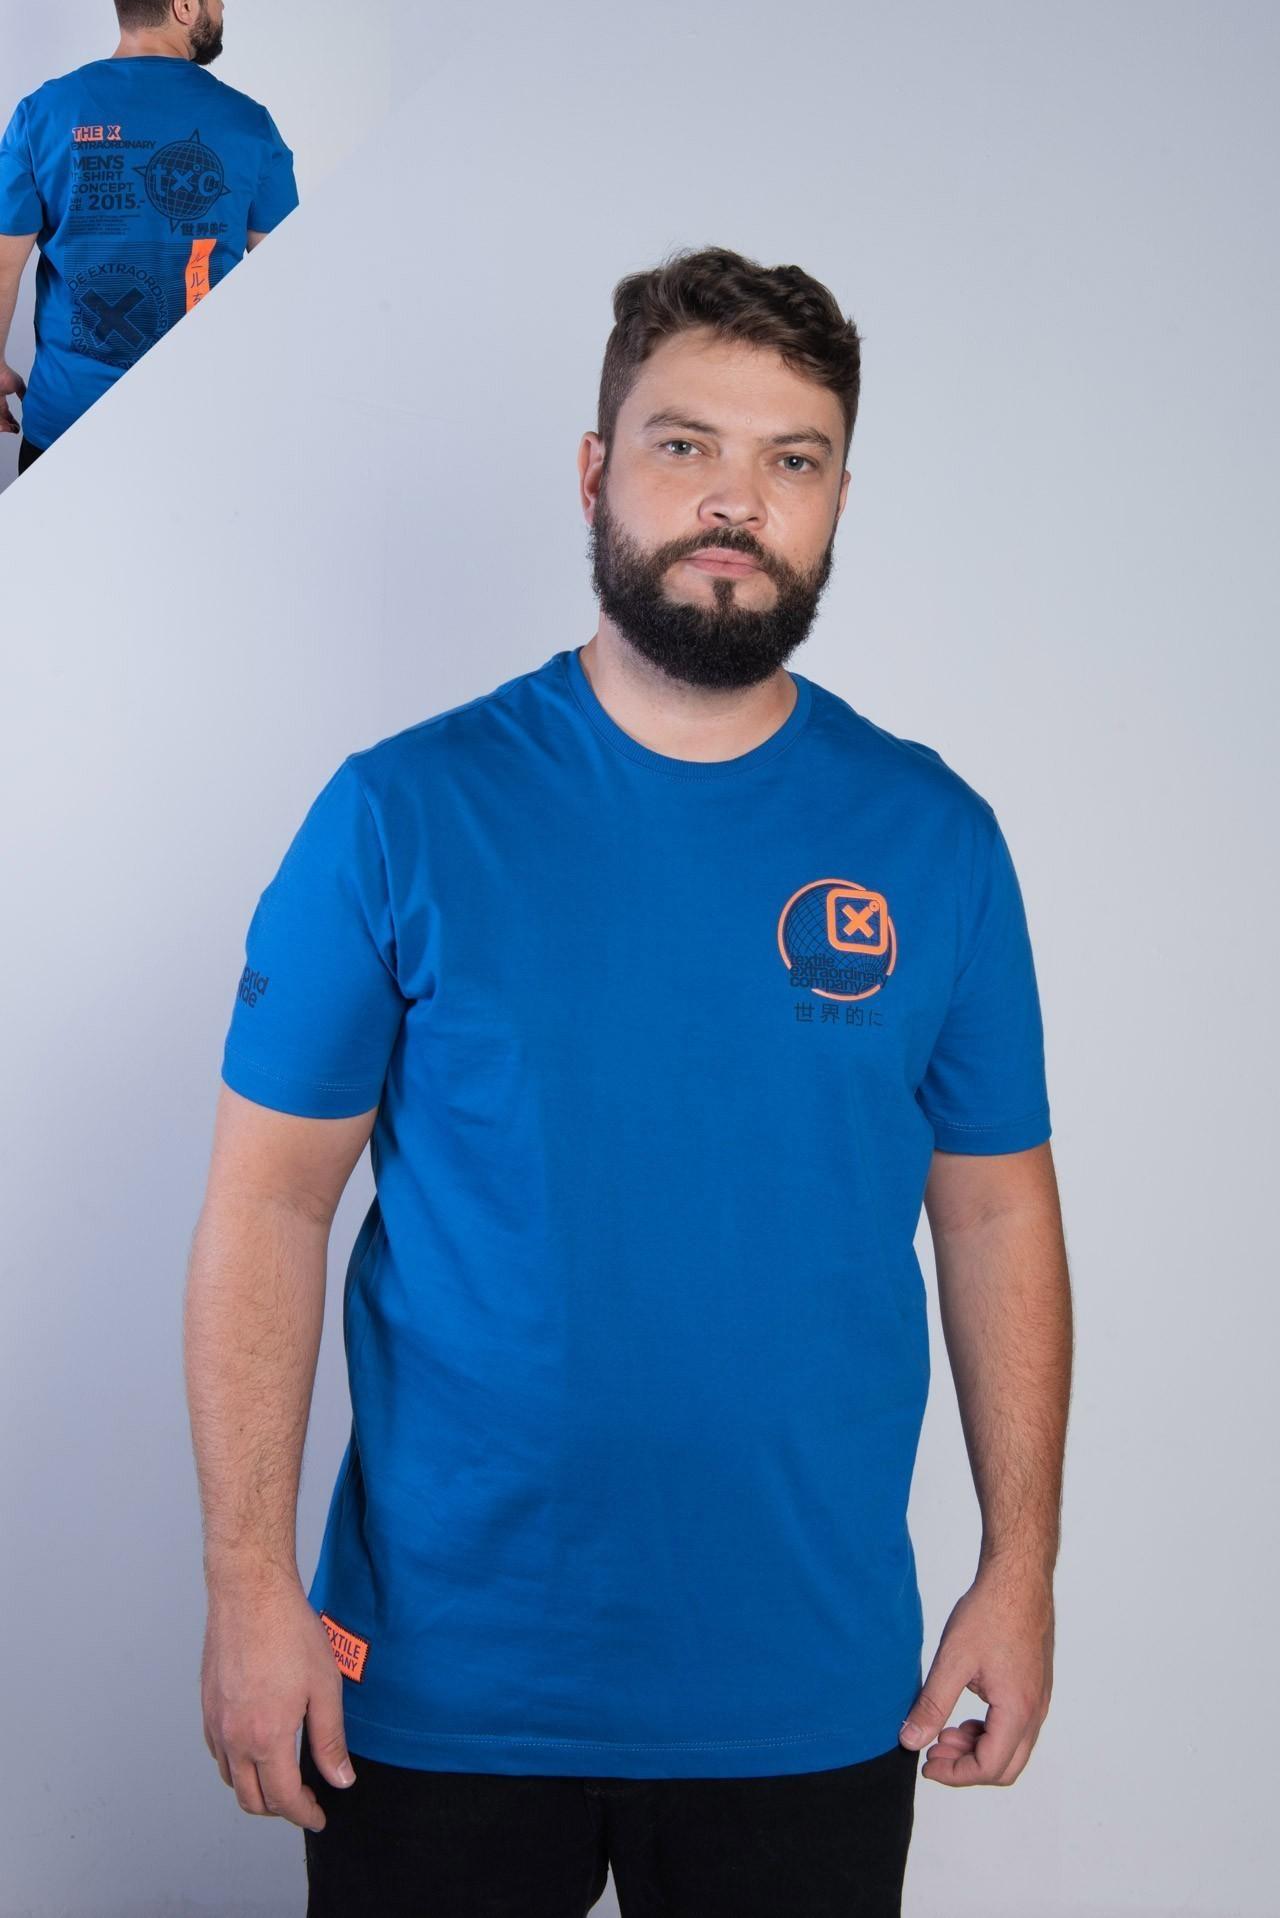 Camiseta Masculina TXC 19139